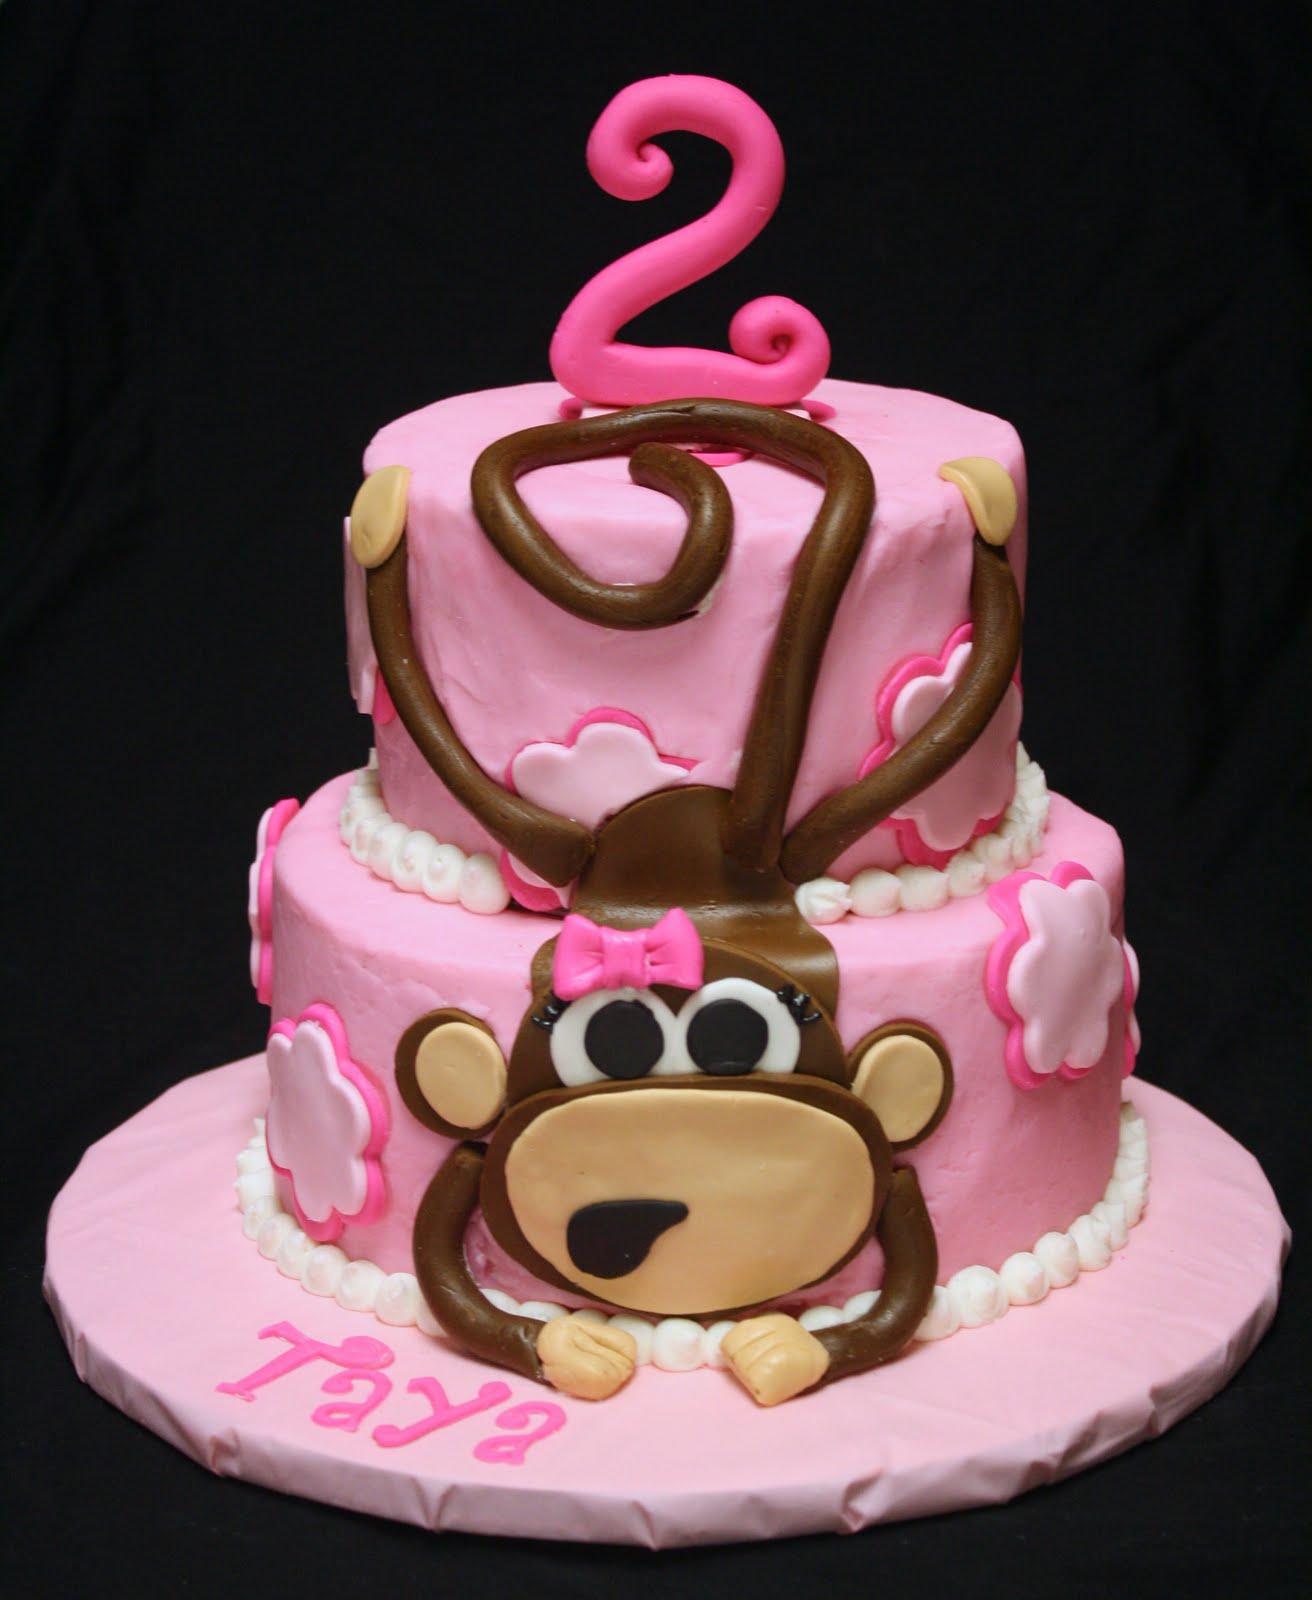 Pleasing 7 Cakes With Monkeys On It Photo Monkey Birthday Cake Monkey Personalised Birthday Cards Paralily Jamesorg